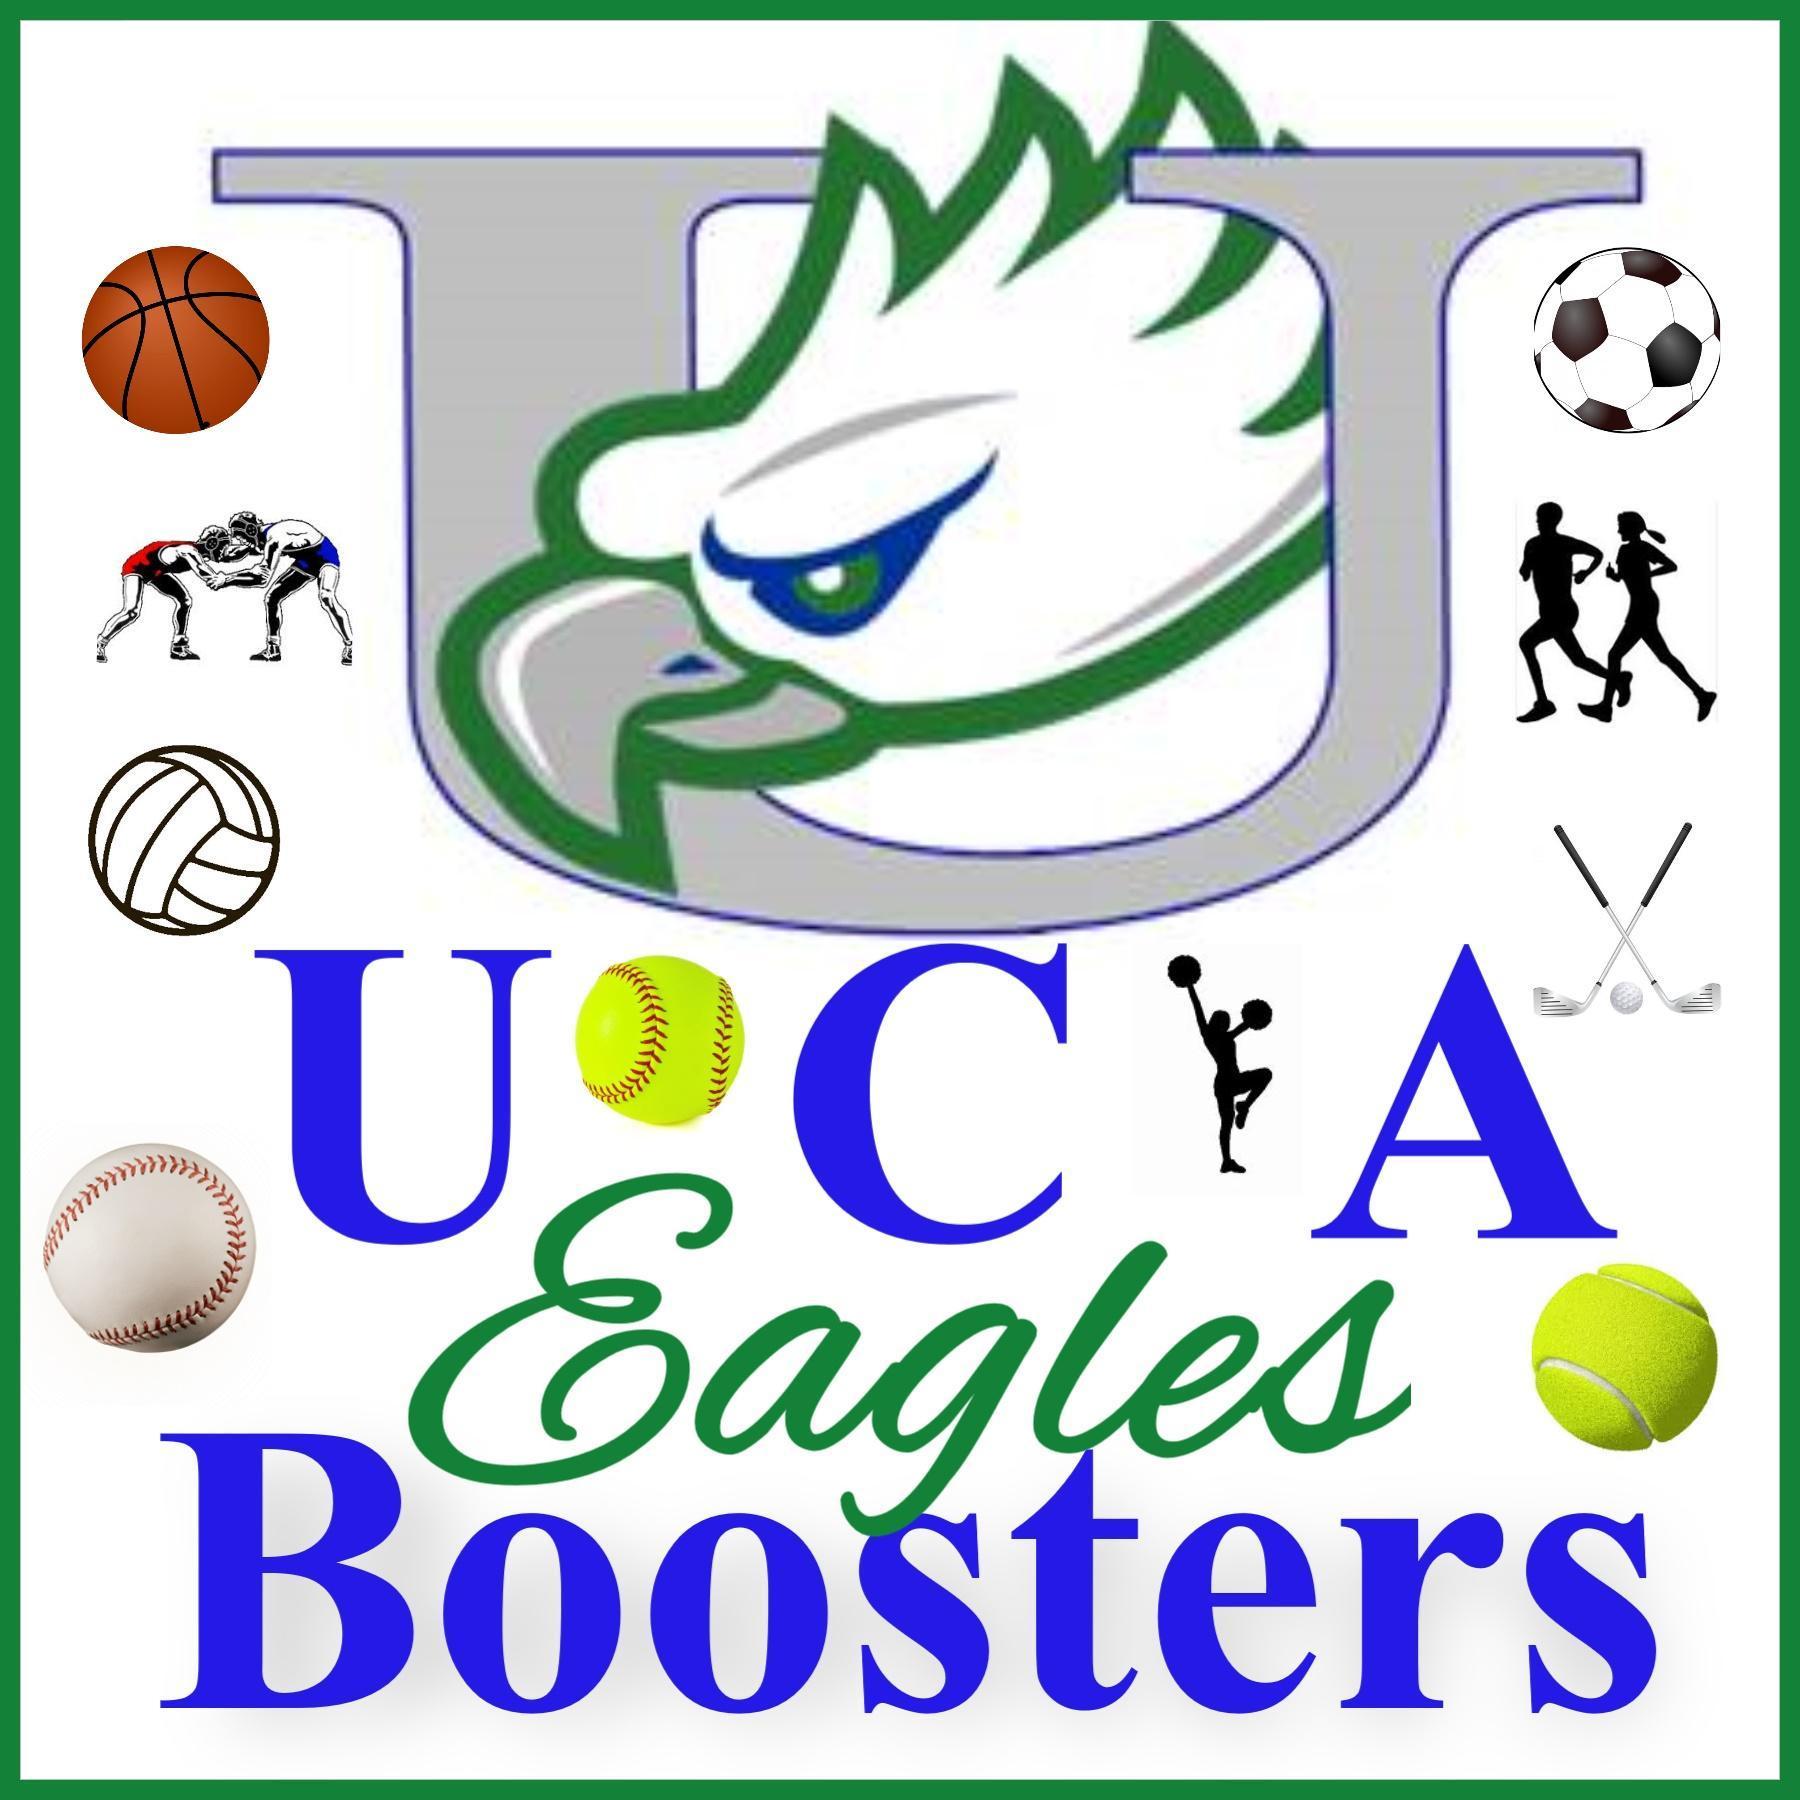 UCA Booster Club Board Application Image